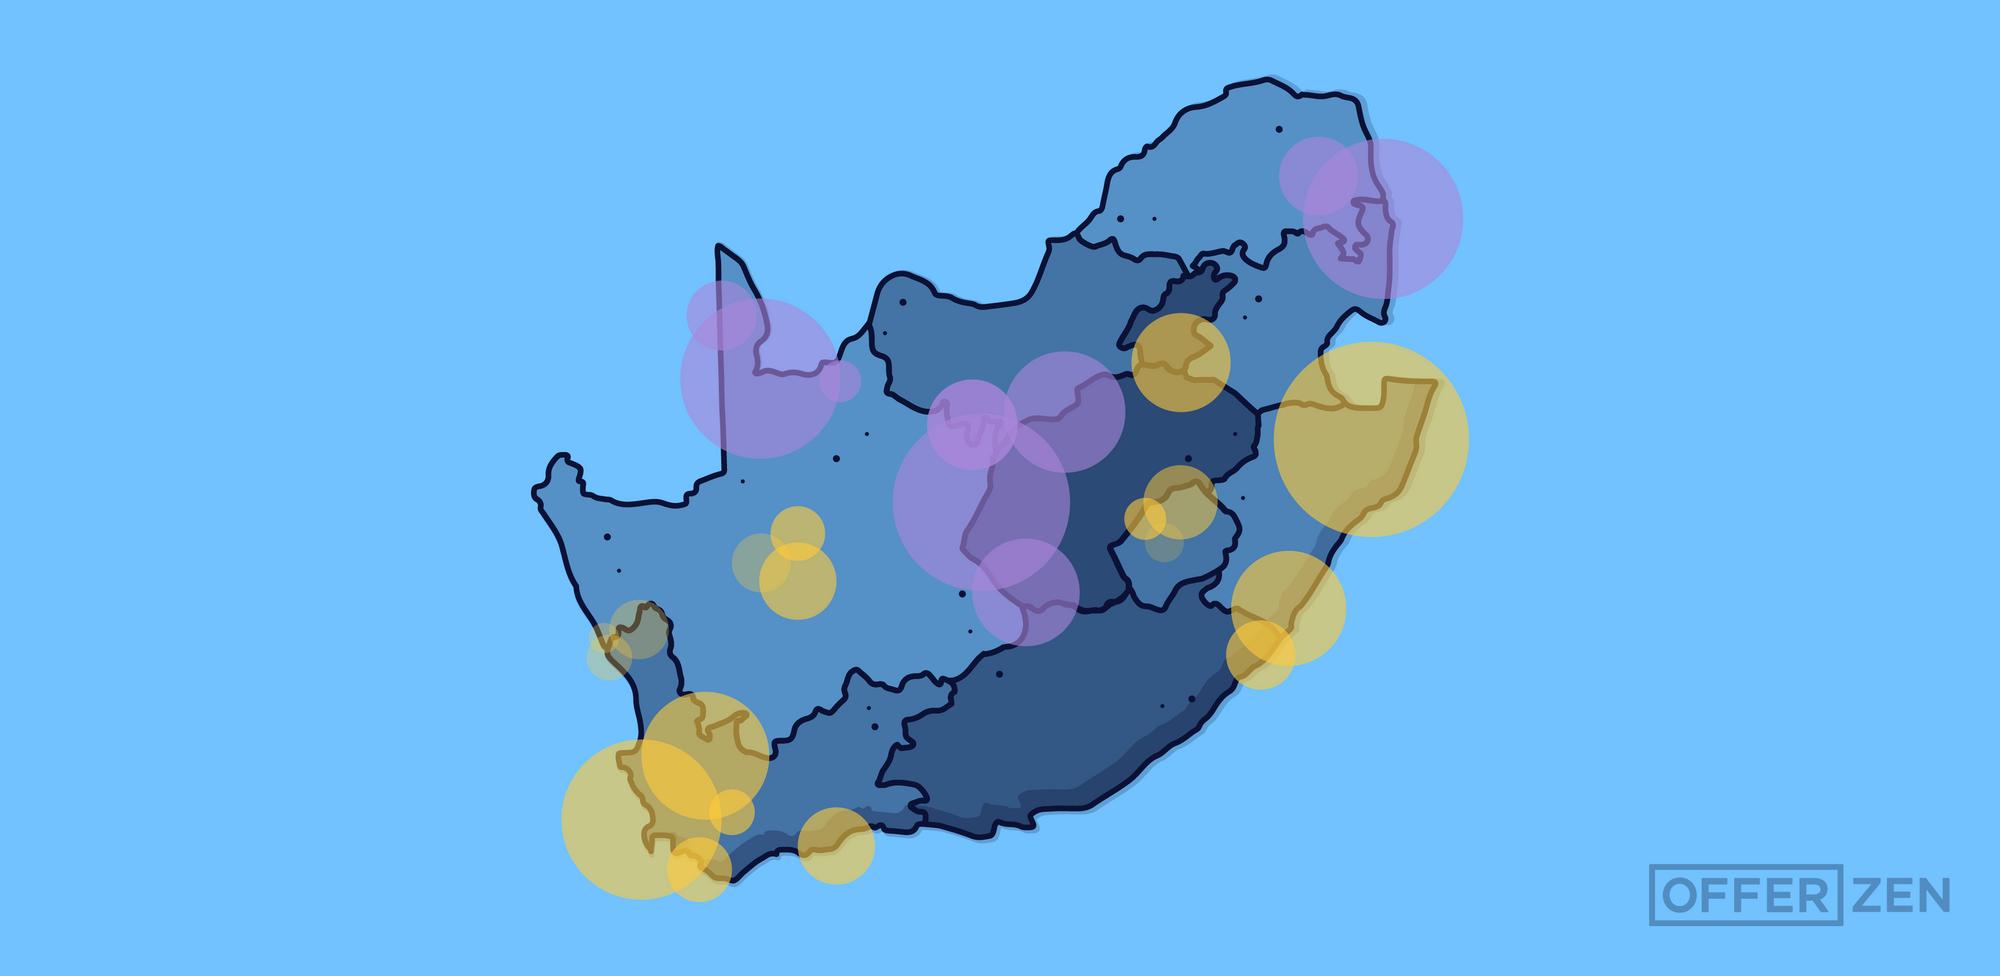 OfferZen_Vulnerable-Communities-Map-Project--Update_Vulnerable-Communities-Map-Project--Update_Cover-Image